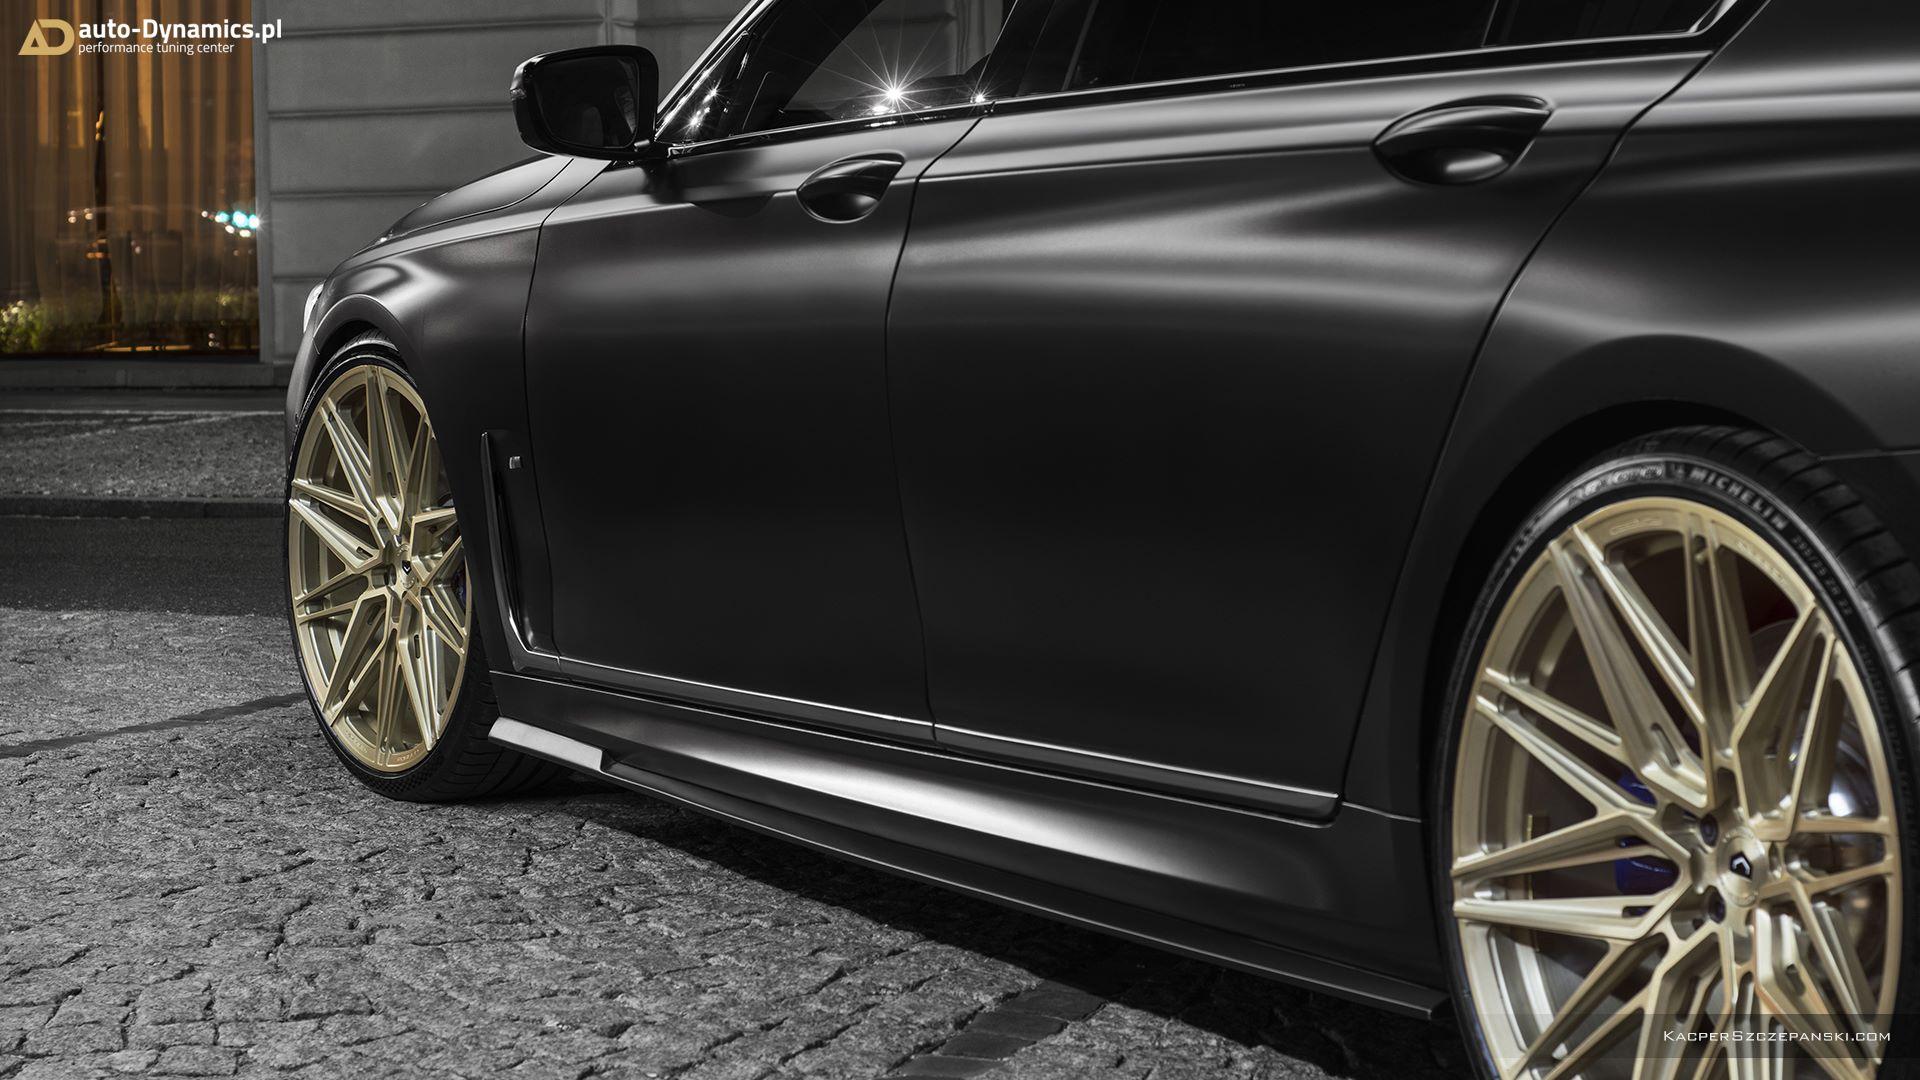 BMW-M760Li-by-Auto-Dynamics-7